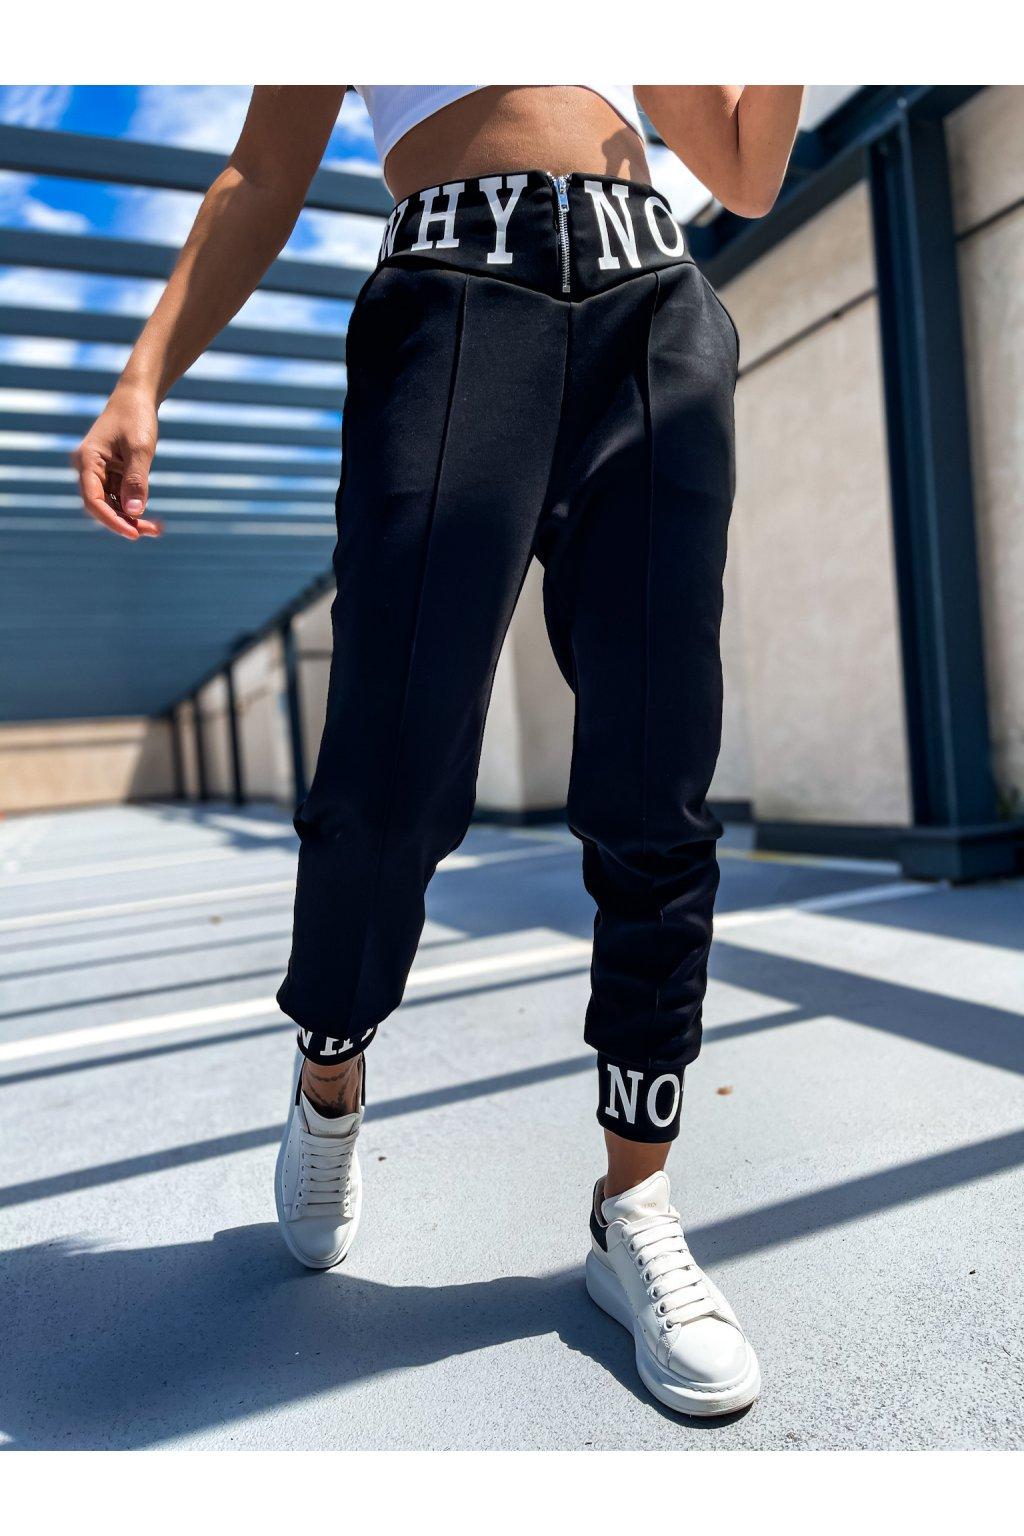 damske teplakove kalhoty why not black eshopat cz 1